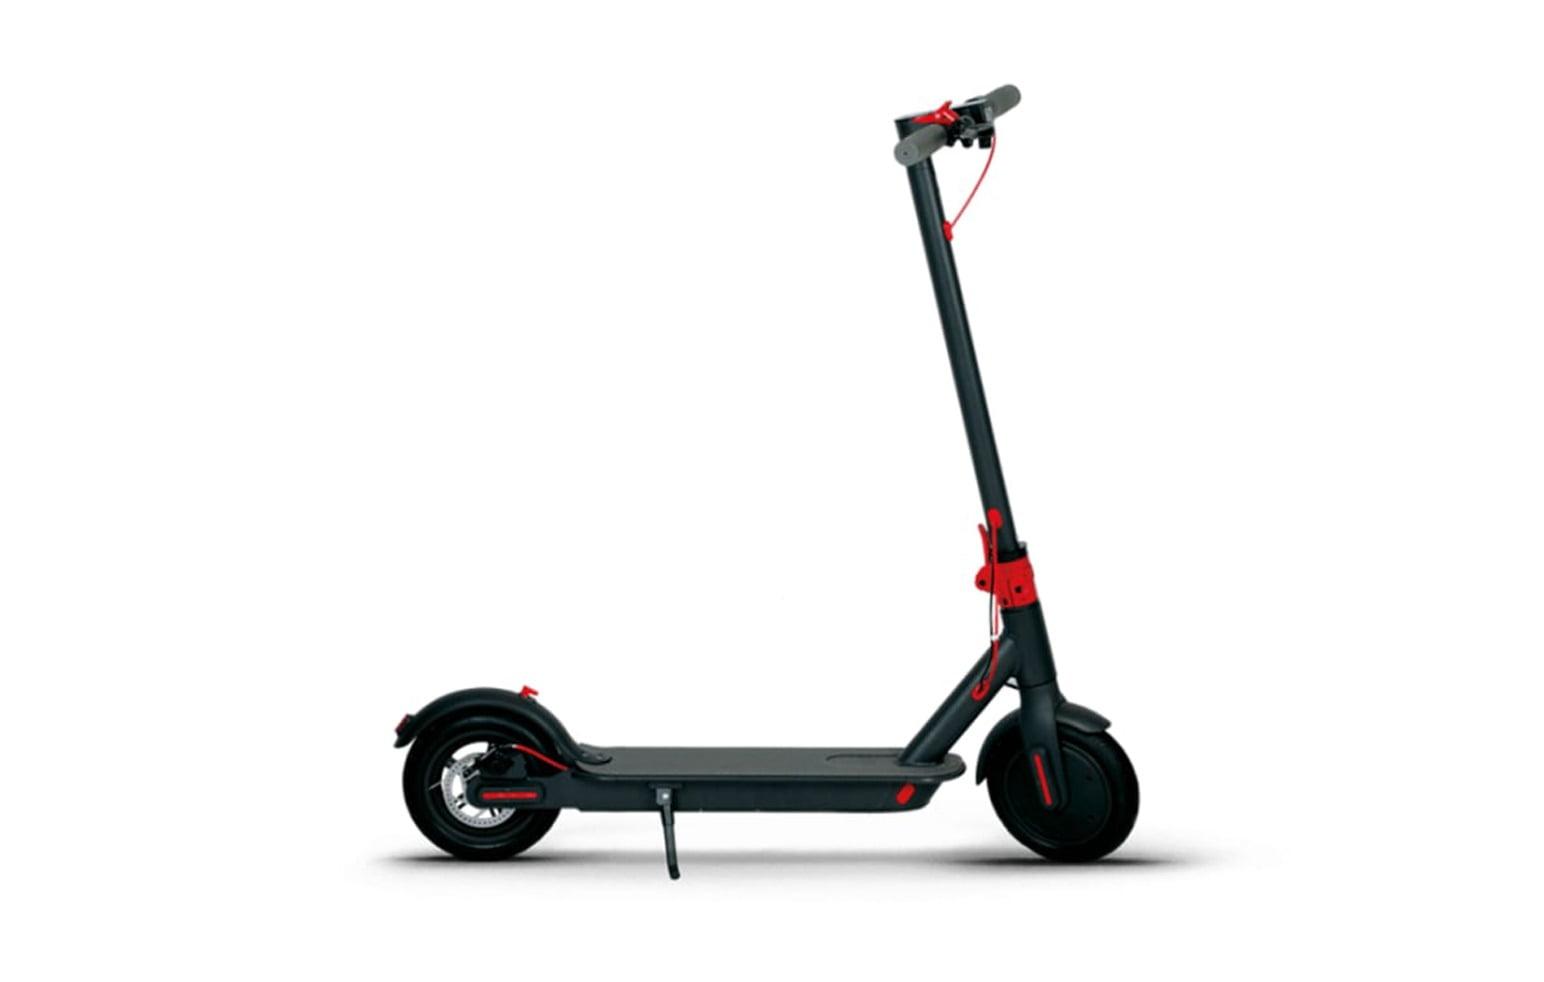 bizero-e-scooter-aylık kiralama-ücretsiz kargo